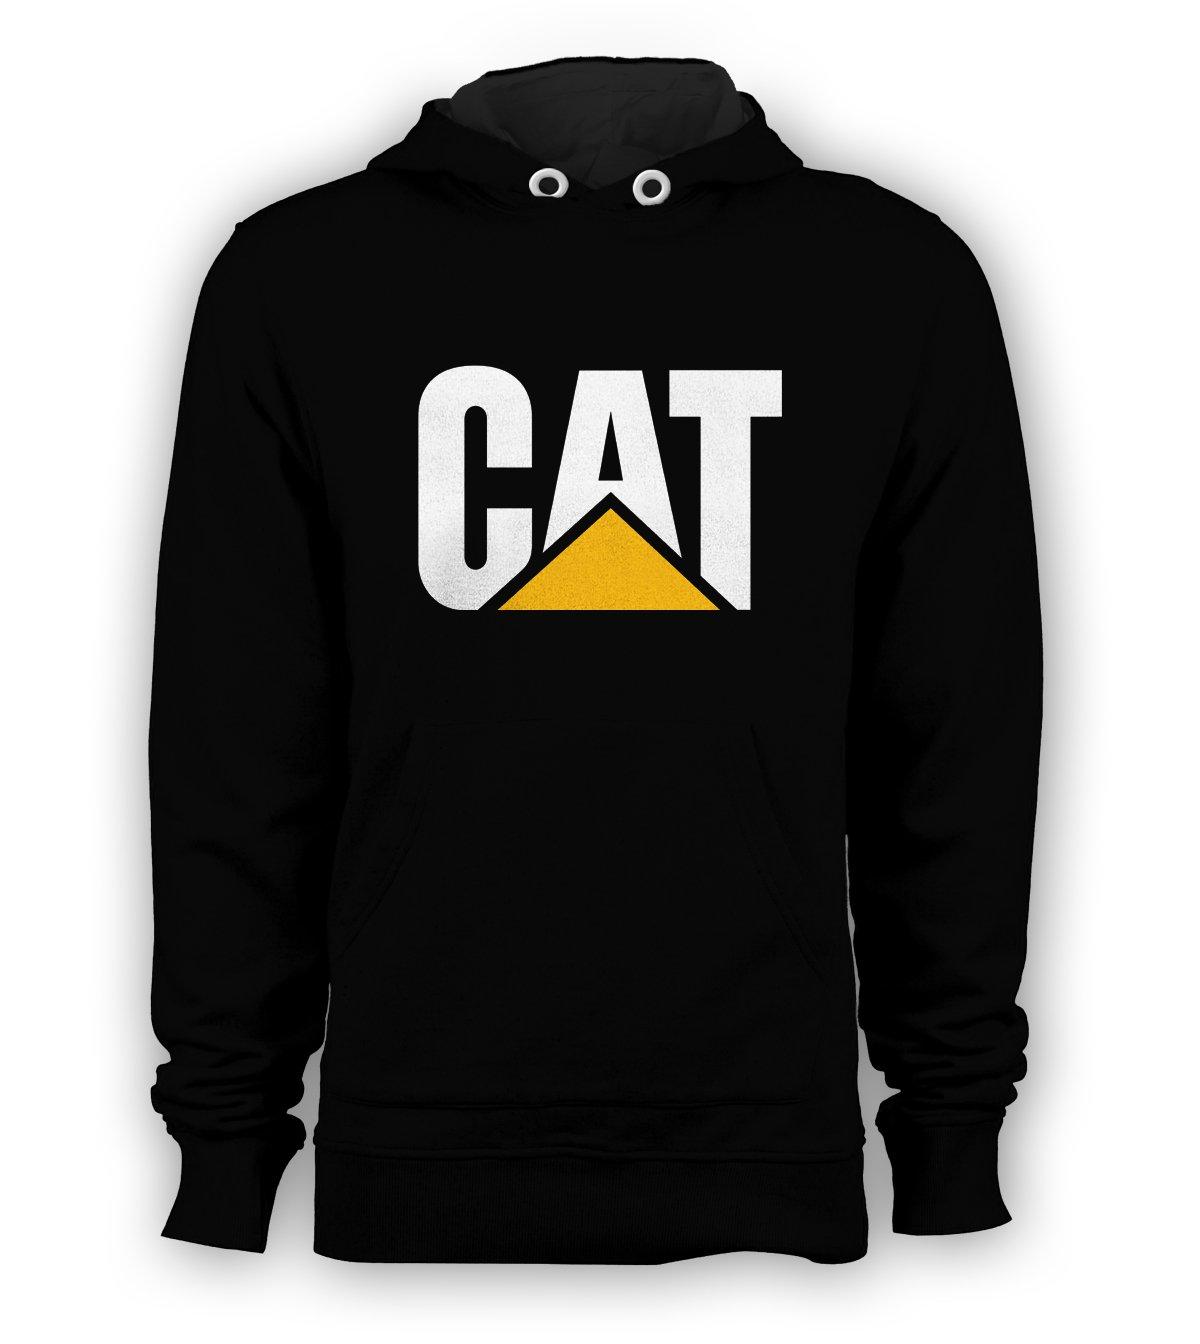 CAT CAterpillar Pullover Hoodie Men Diesel Tractor Boot Sweatshirts Size S to 3XL New Black